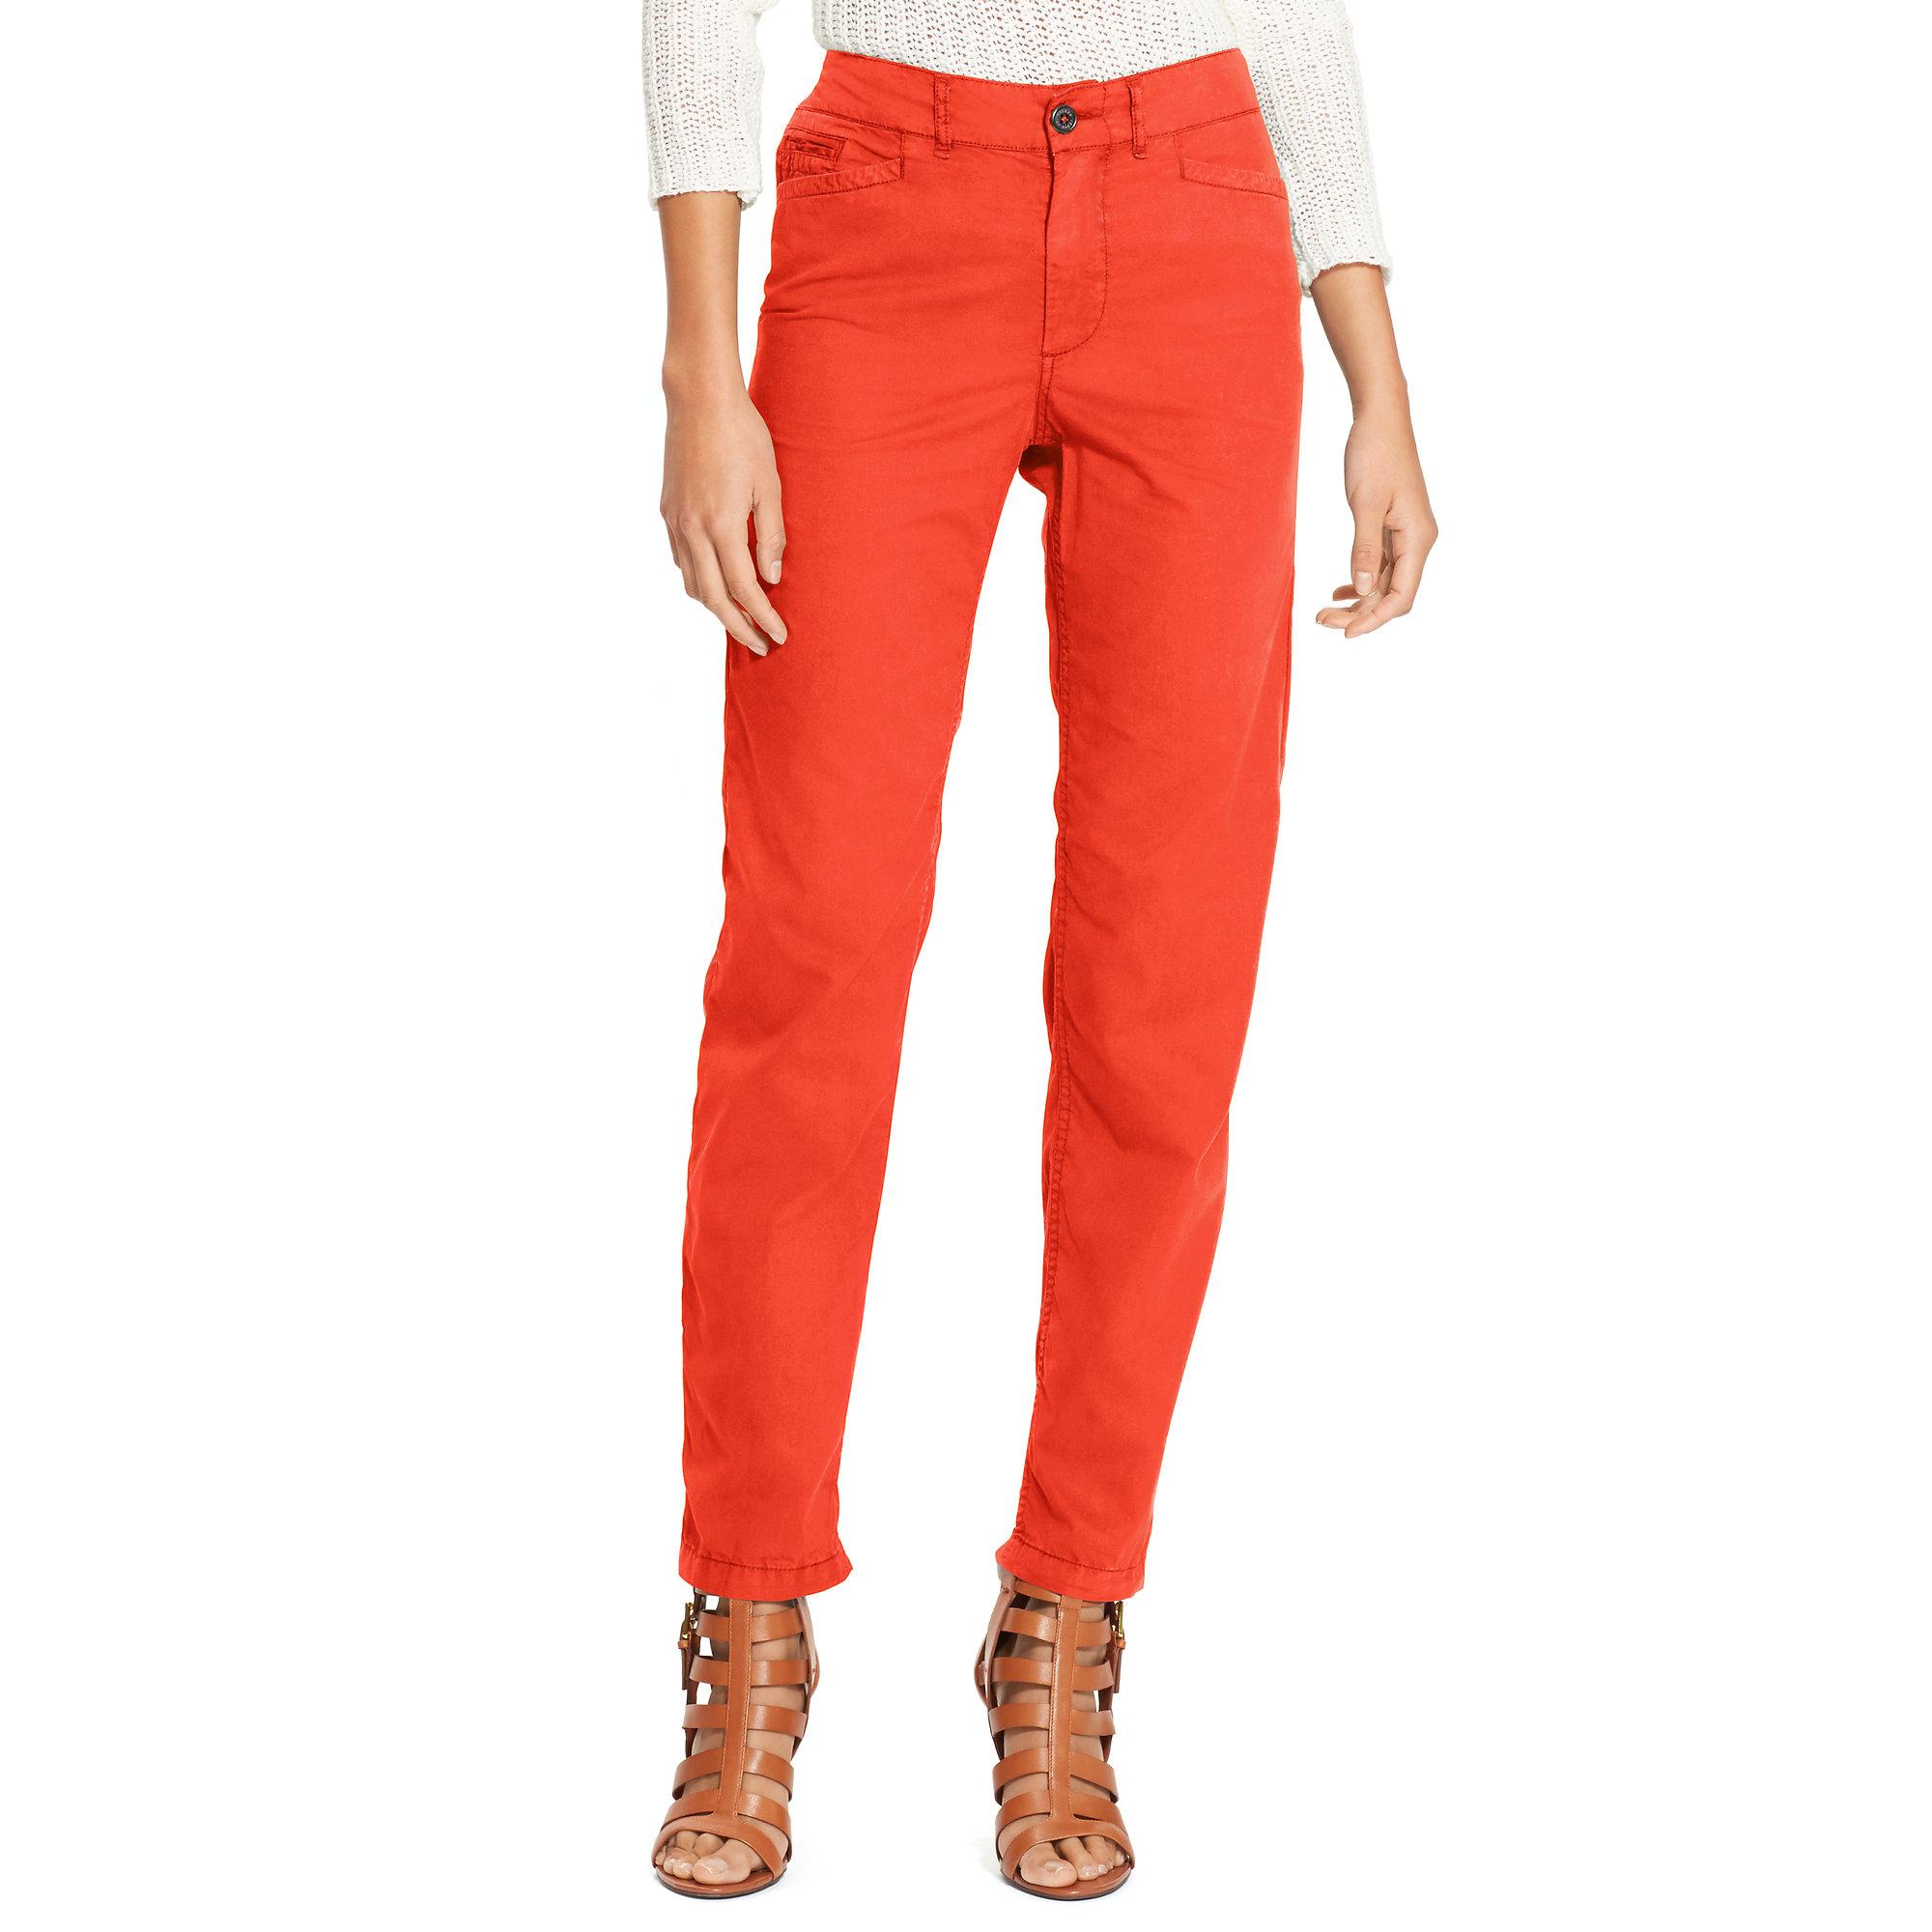 Rolf S Nyc Ralph Lauren Straight Leg Chino Pant In Orange Lyst